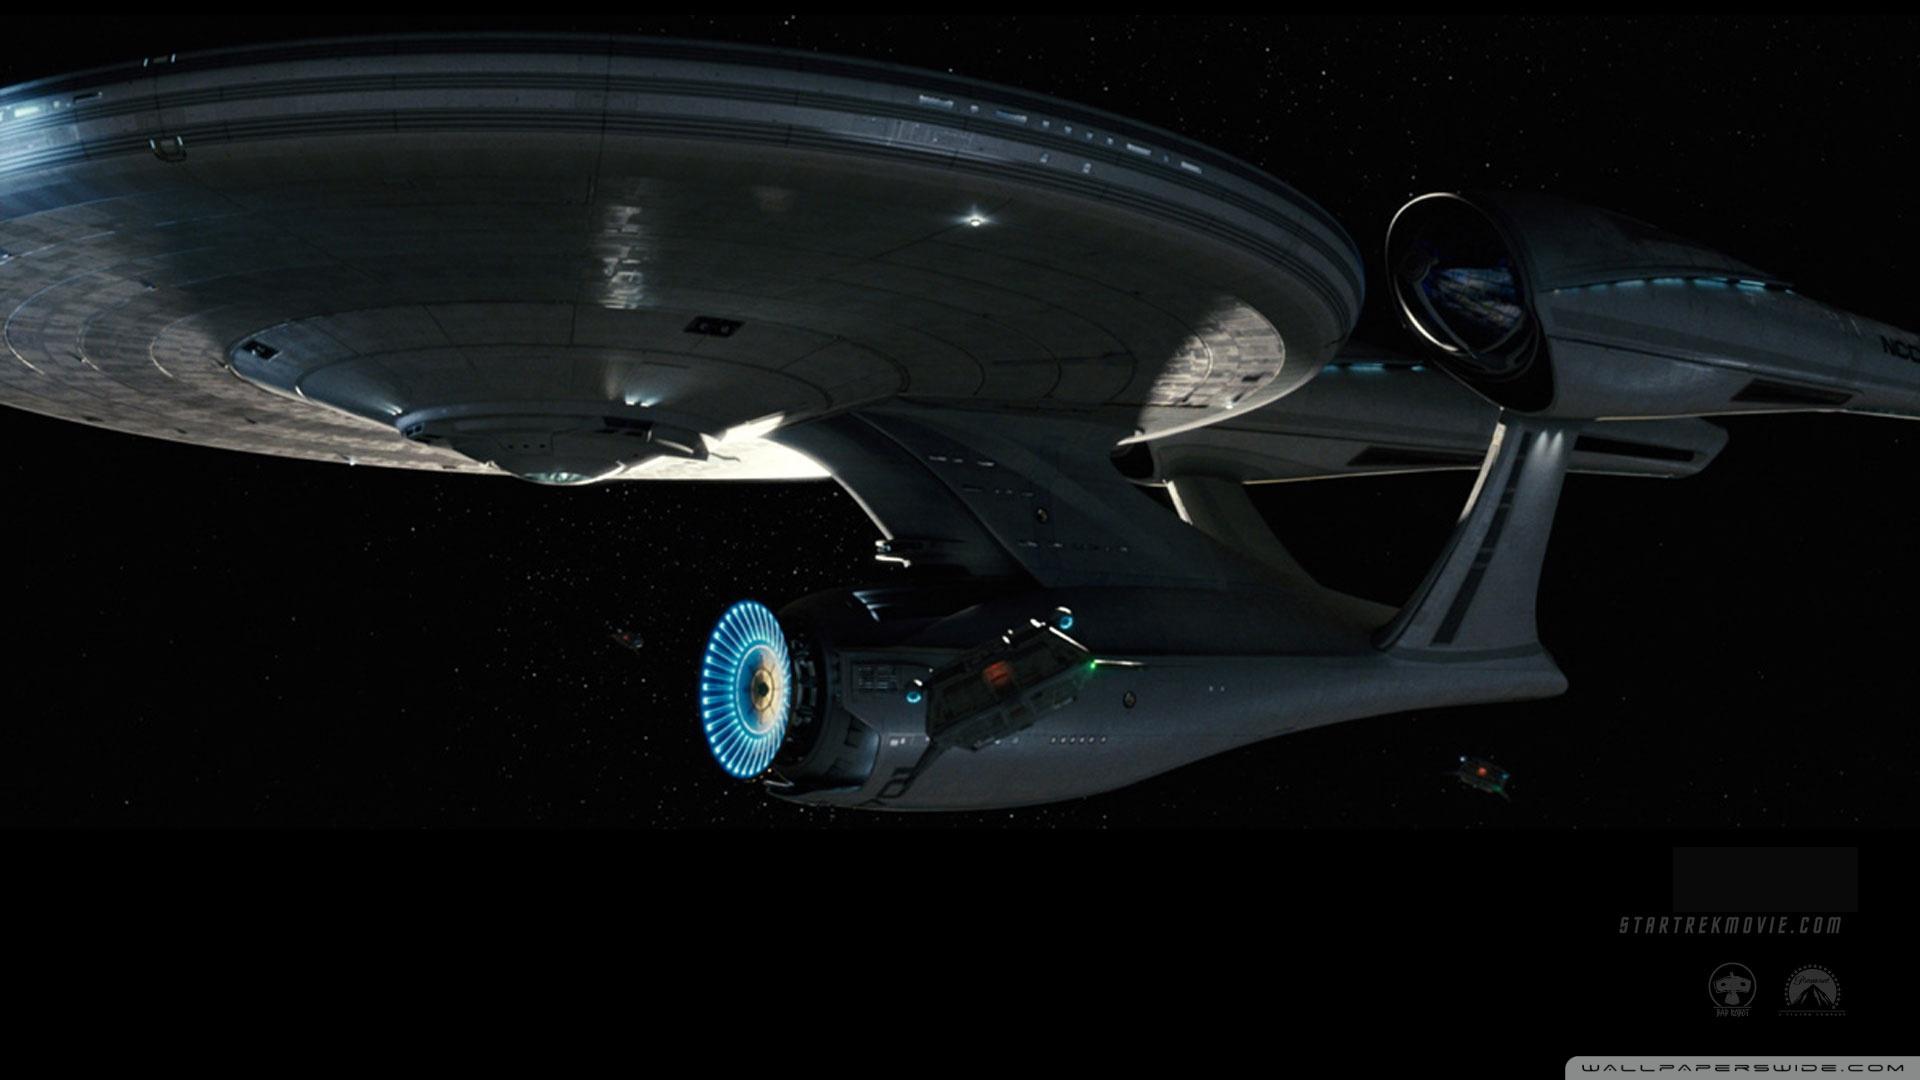 Standard - Uss Enterprise Star Trek 2009 , HD Wallpaper & Backgrounds